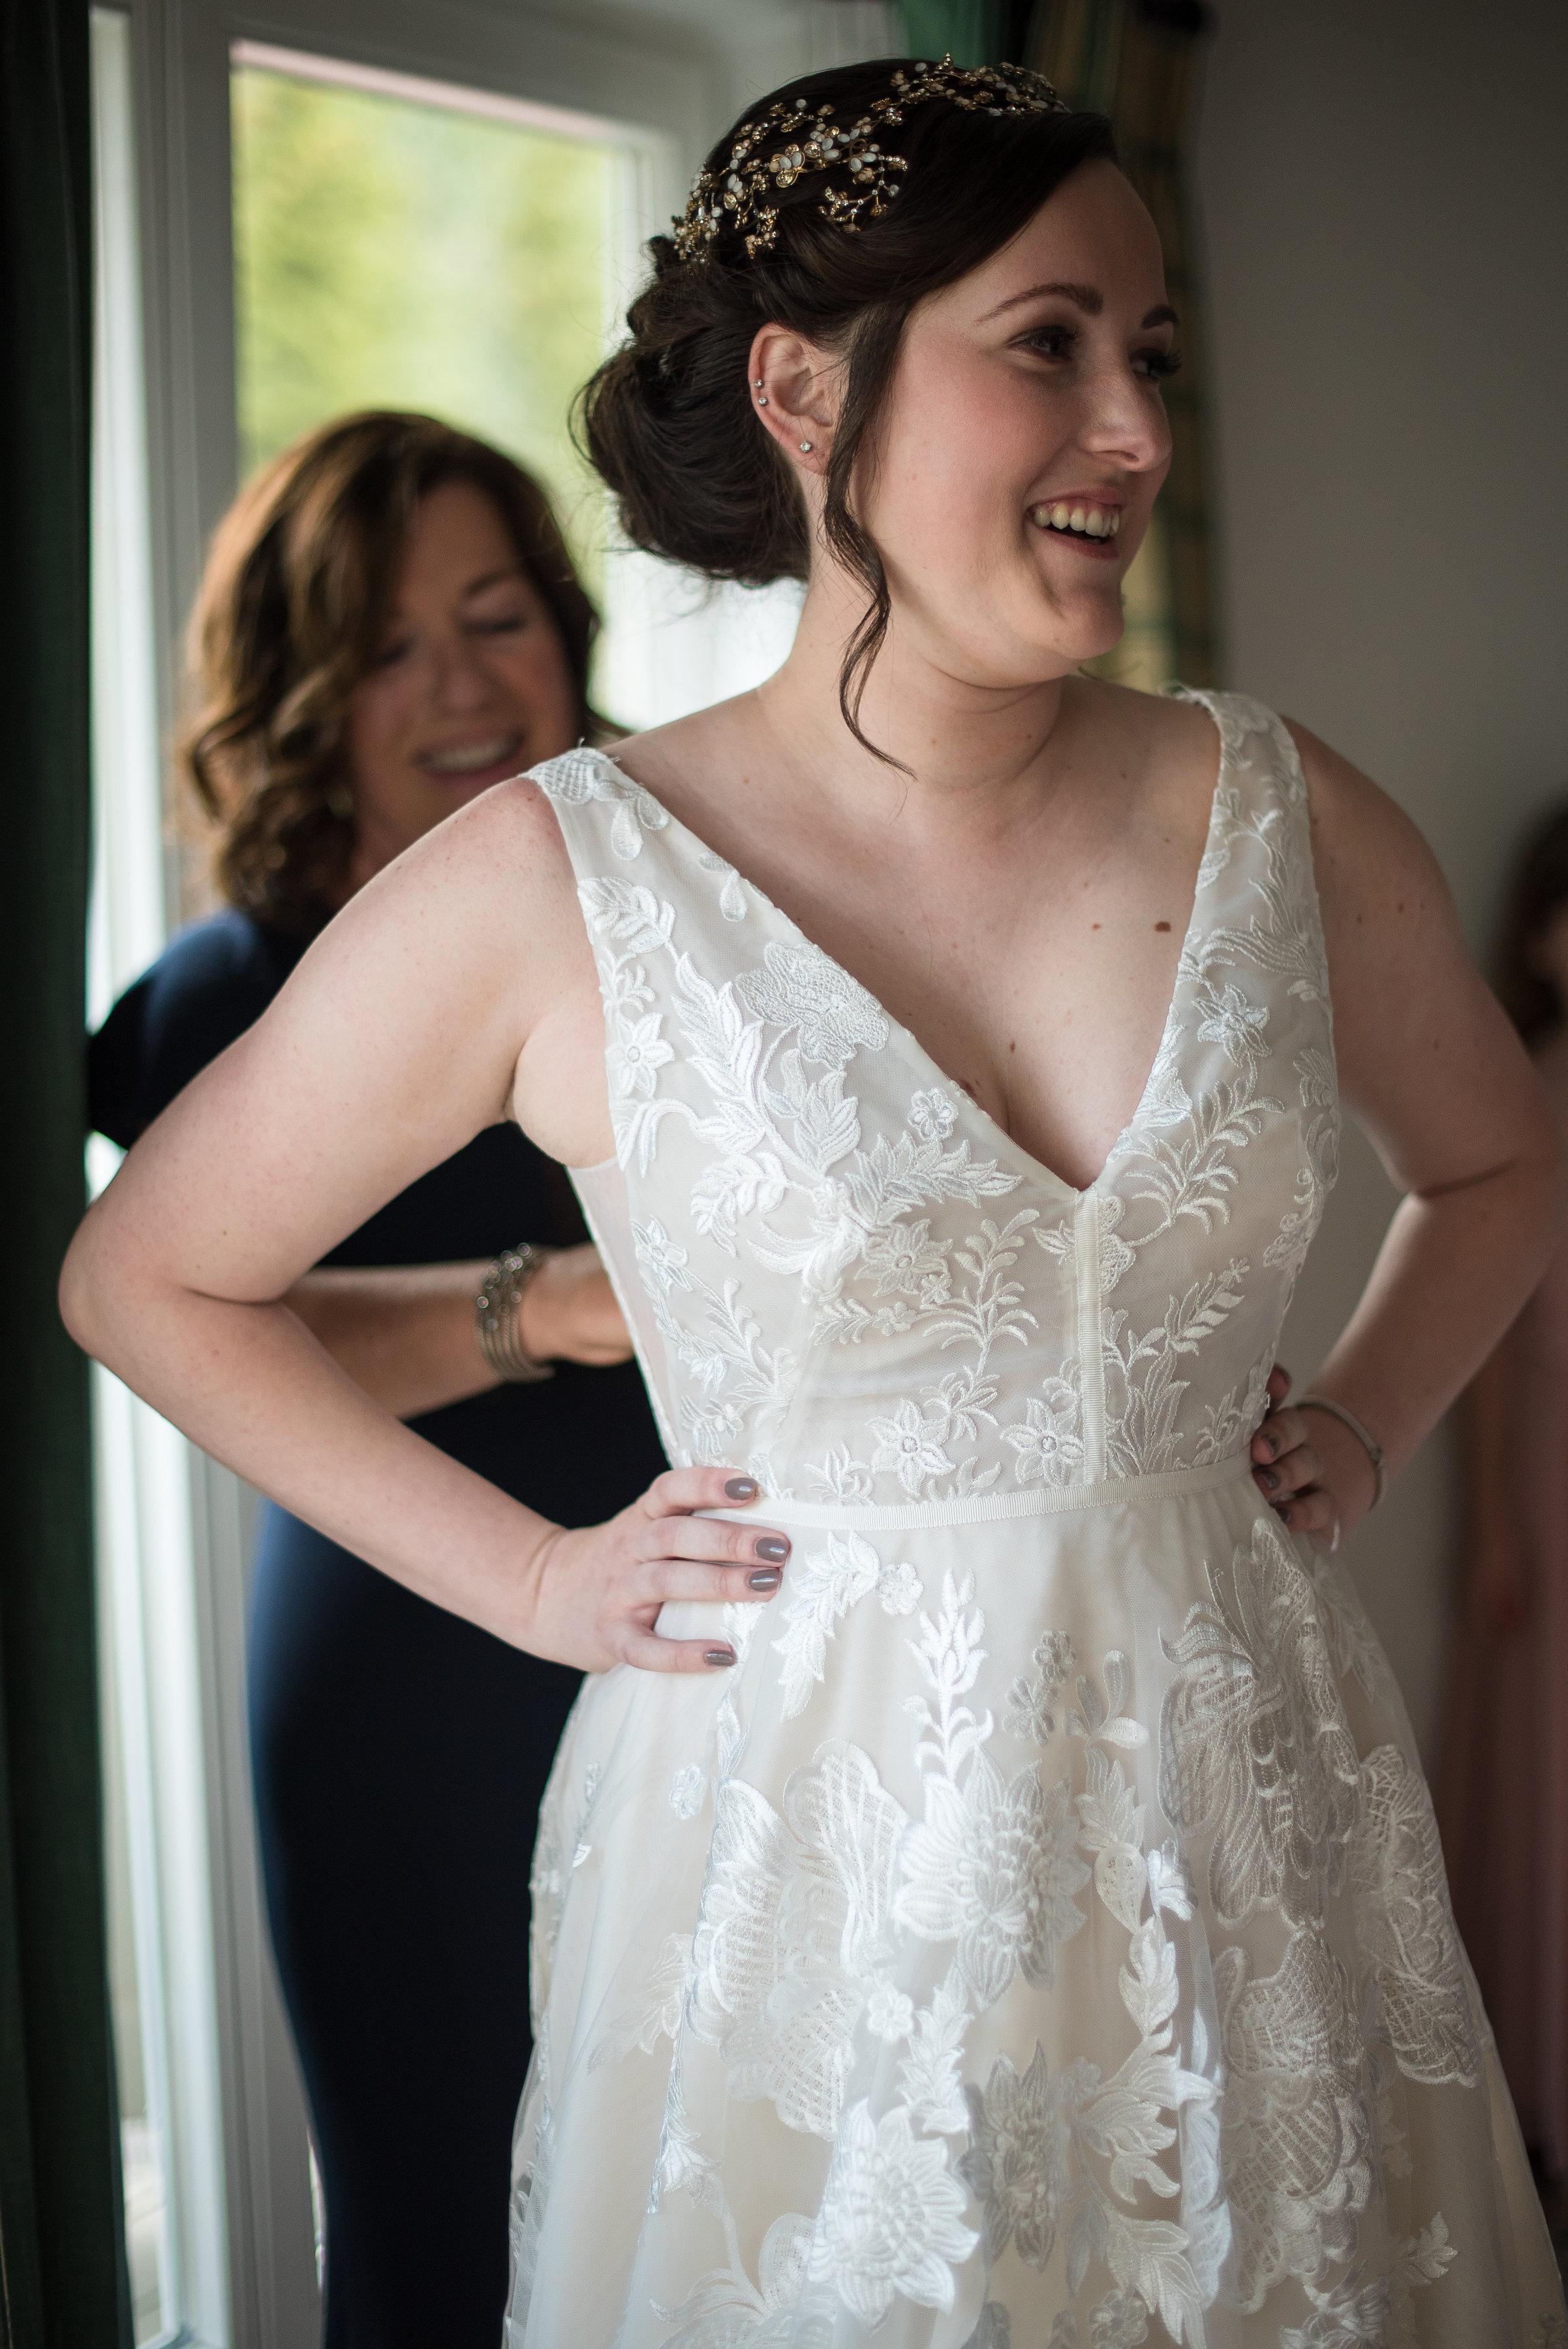 Charlotte Ryans Chic Sonnenalp Vail Wedding Little White Dress